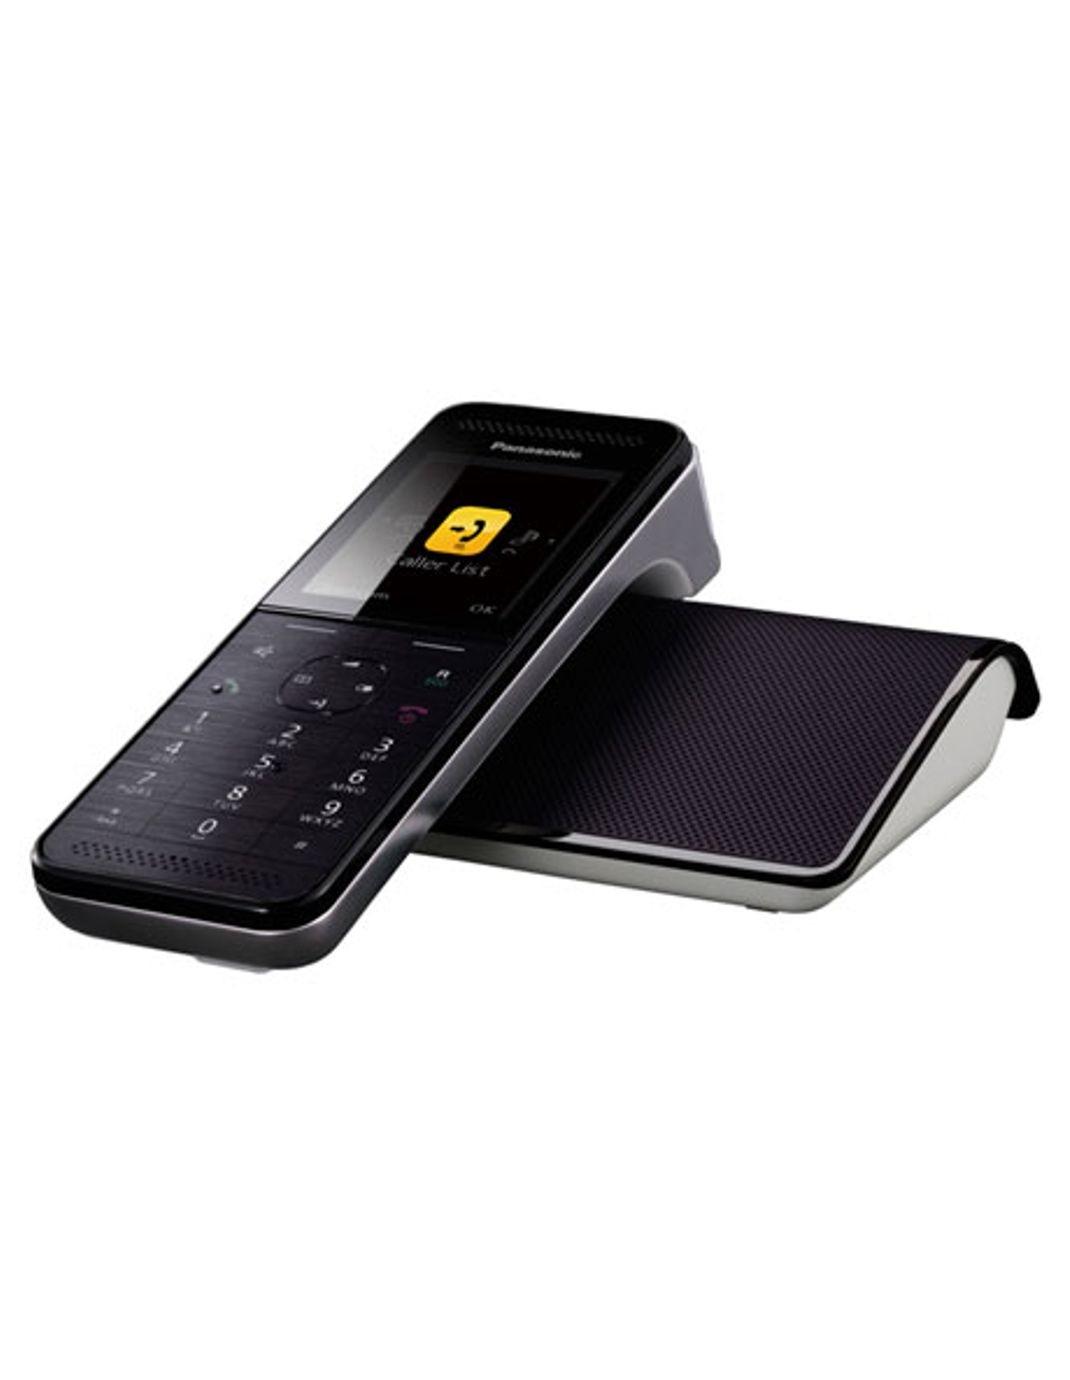 Panasonic Kx Prw120 Wi Fi Cordless Phone Myer Online